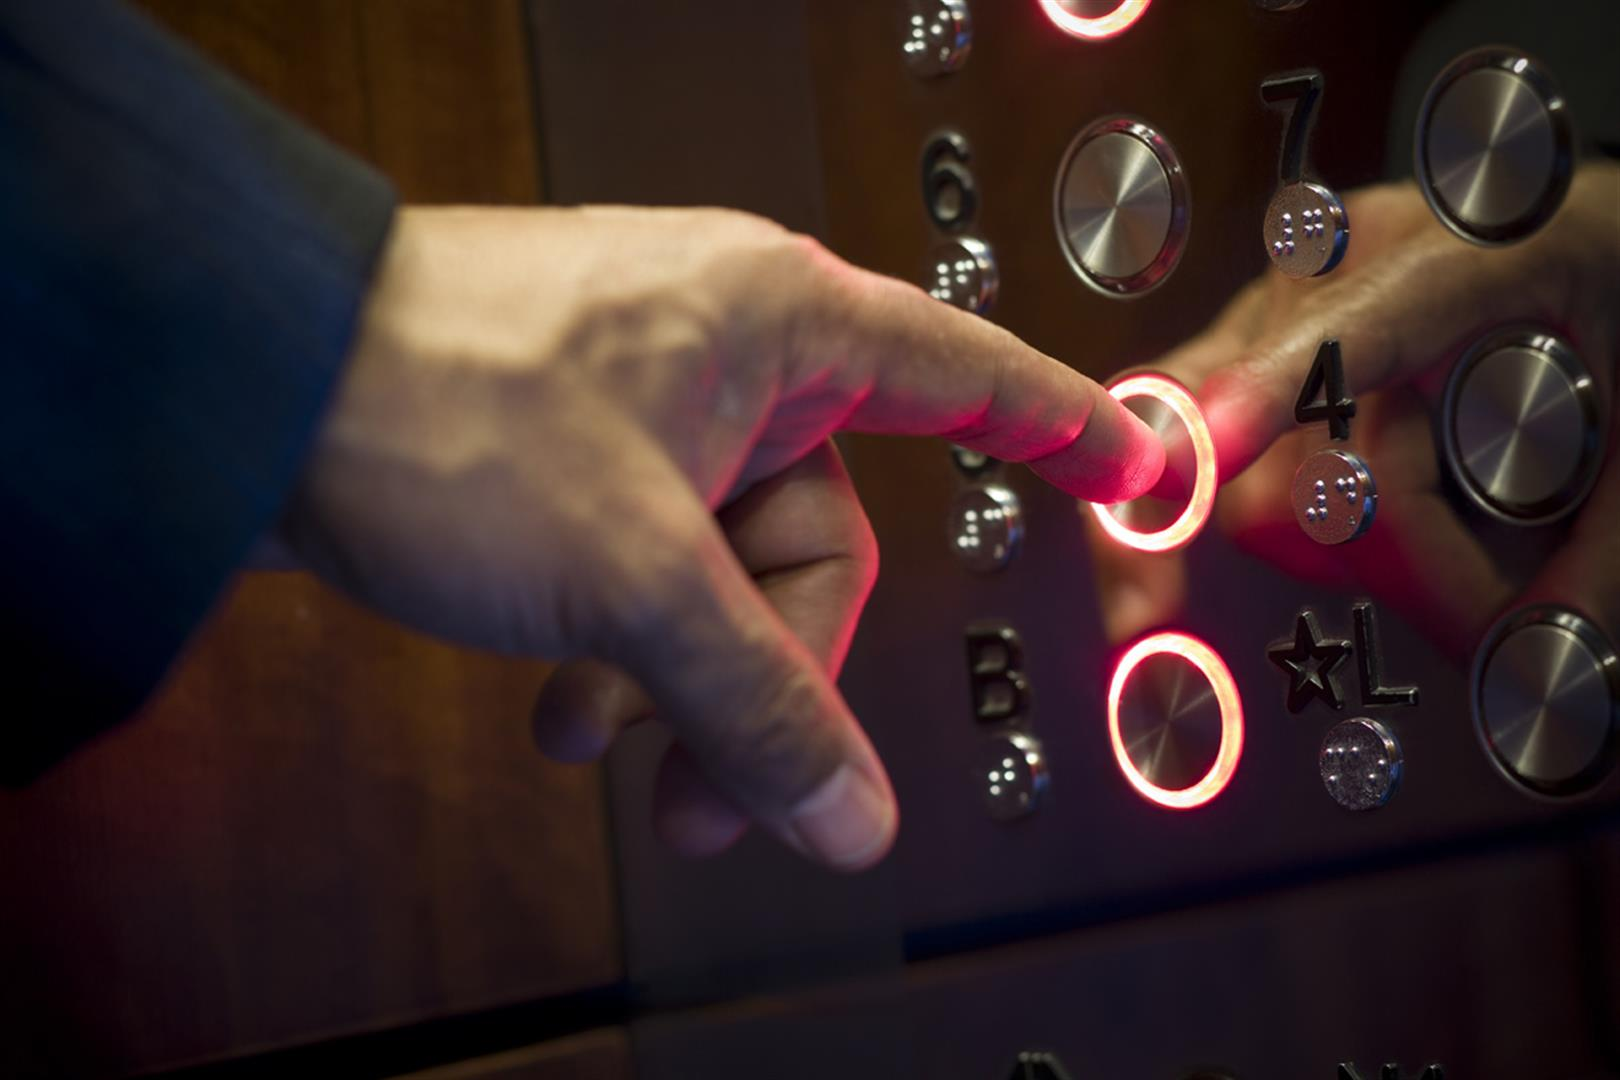 finger on lift button